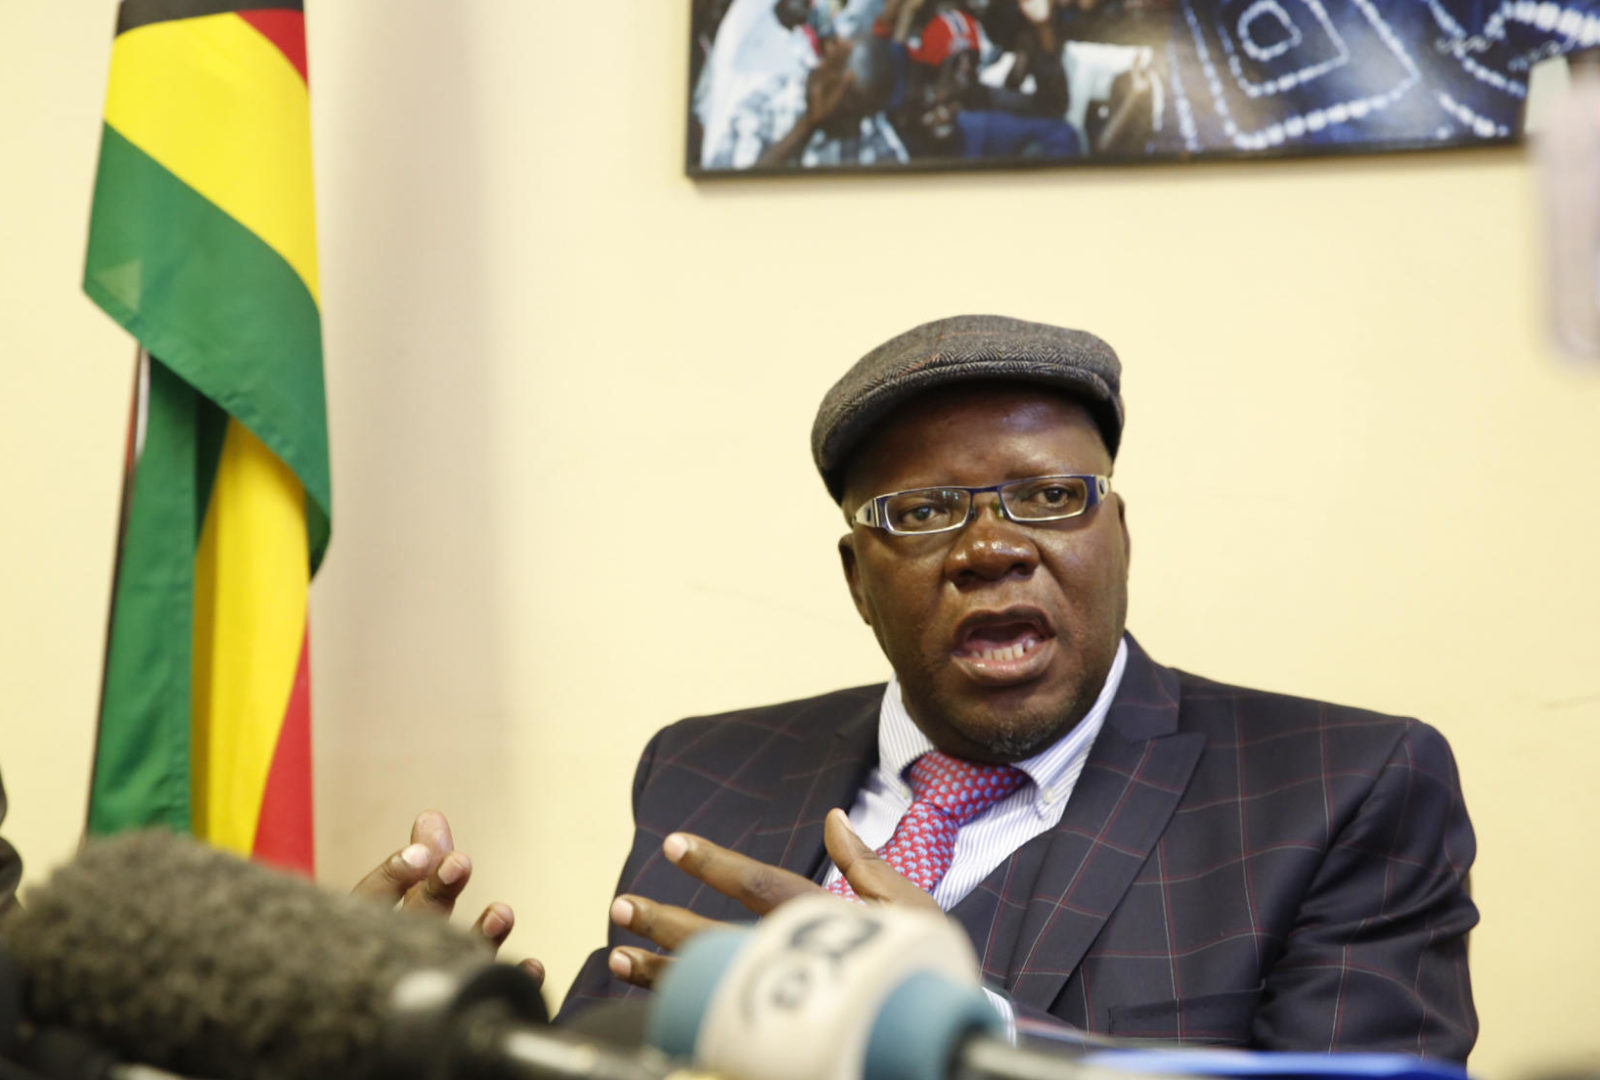 Breaking: Tendai Biti arrested at border while trying to flee Zimbabwe - Zimbabwe Situation